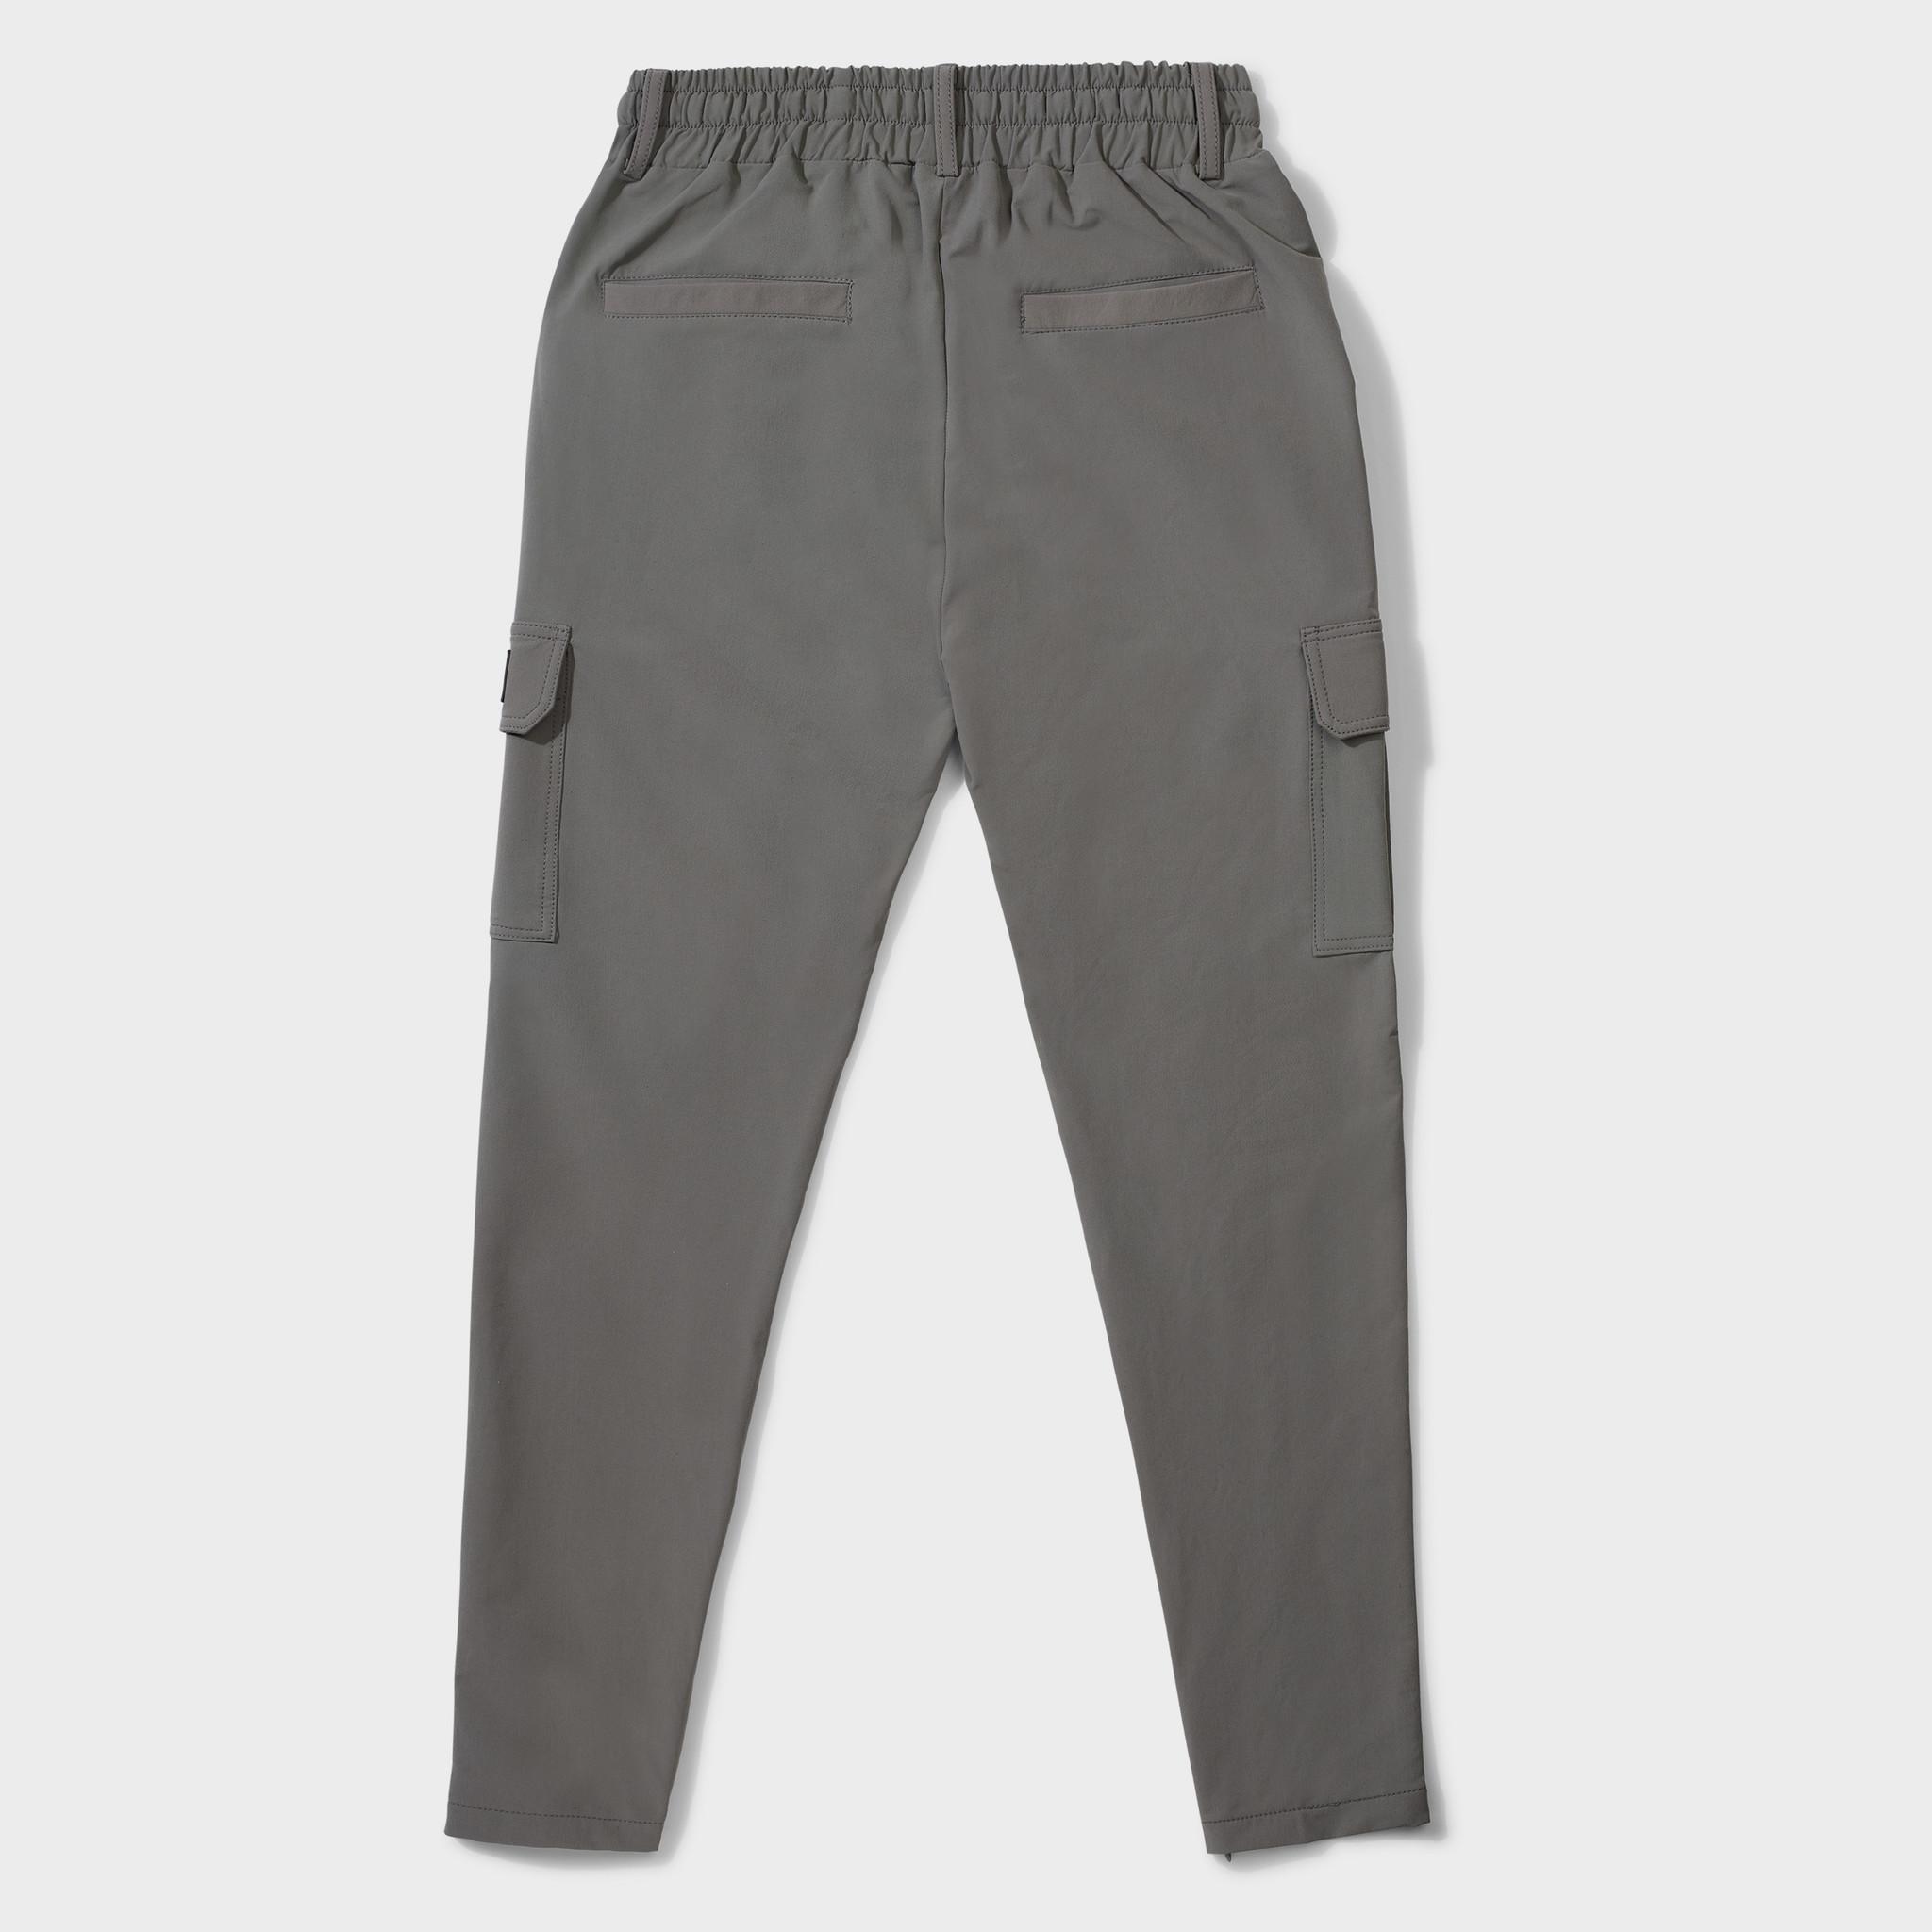 Cargo pants olive-2